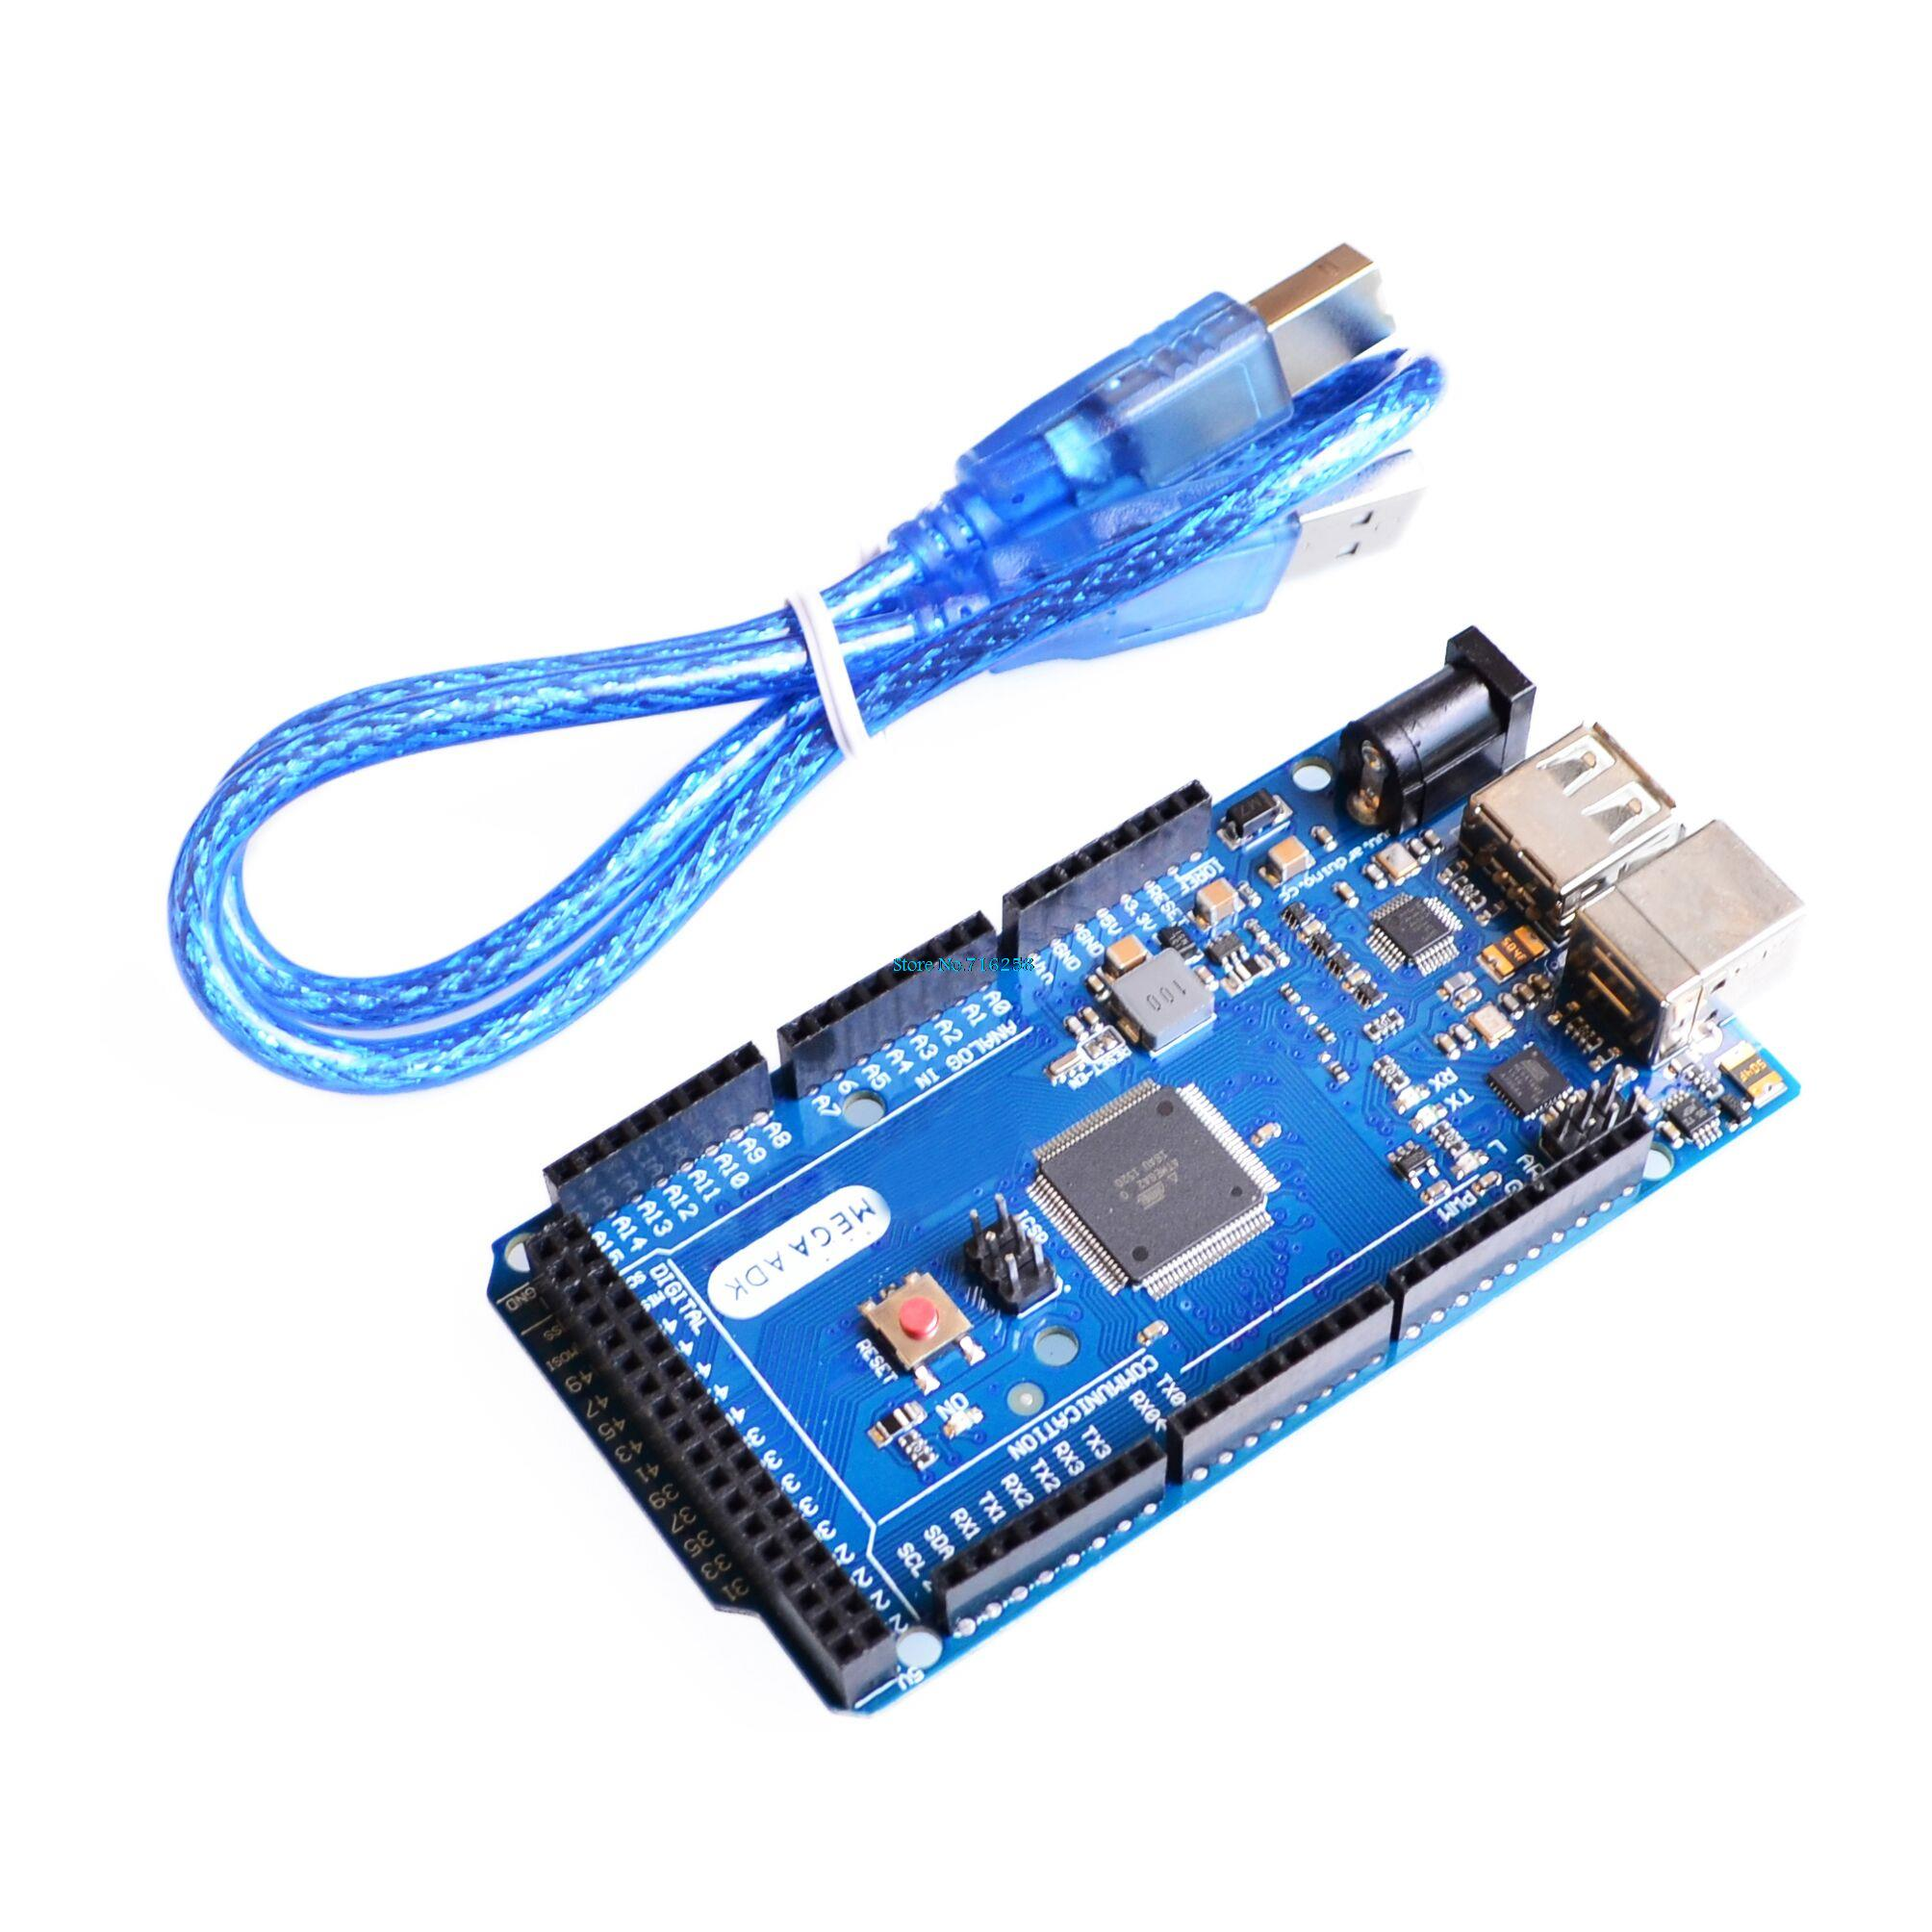 1set=1pcs ADK Mega 2560 2012 ARM Version Main Control Board + 1pcs USB cable, Compatible with (Google ADK 2012) for1set=1pcs ADK Mega 2560 2012 ARM Version Main Control Board + 1pcs USB cable, Compatible with (Google ADK 2012) for